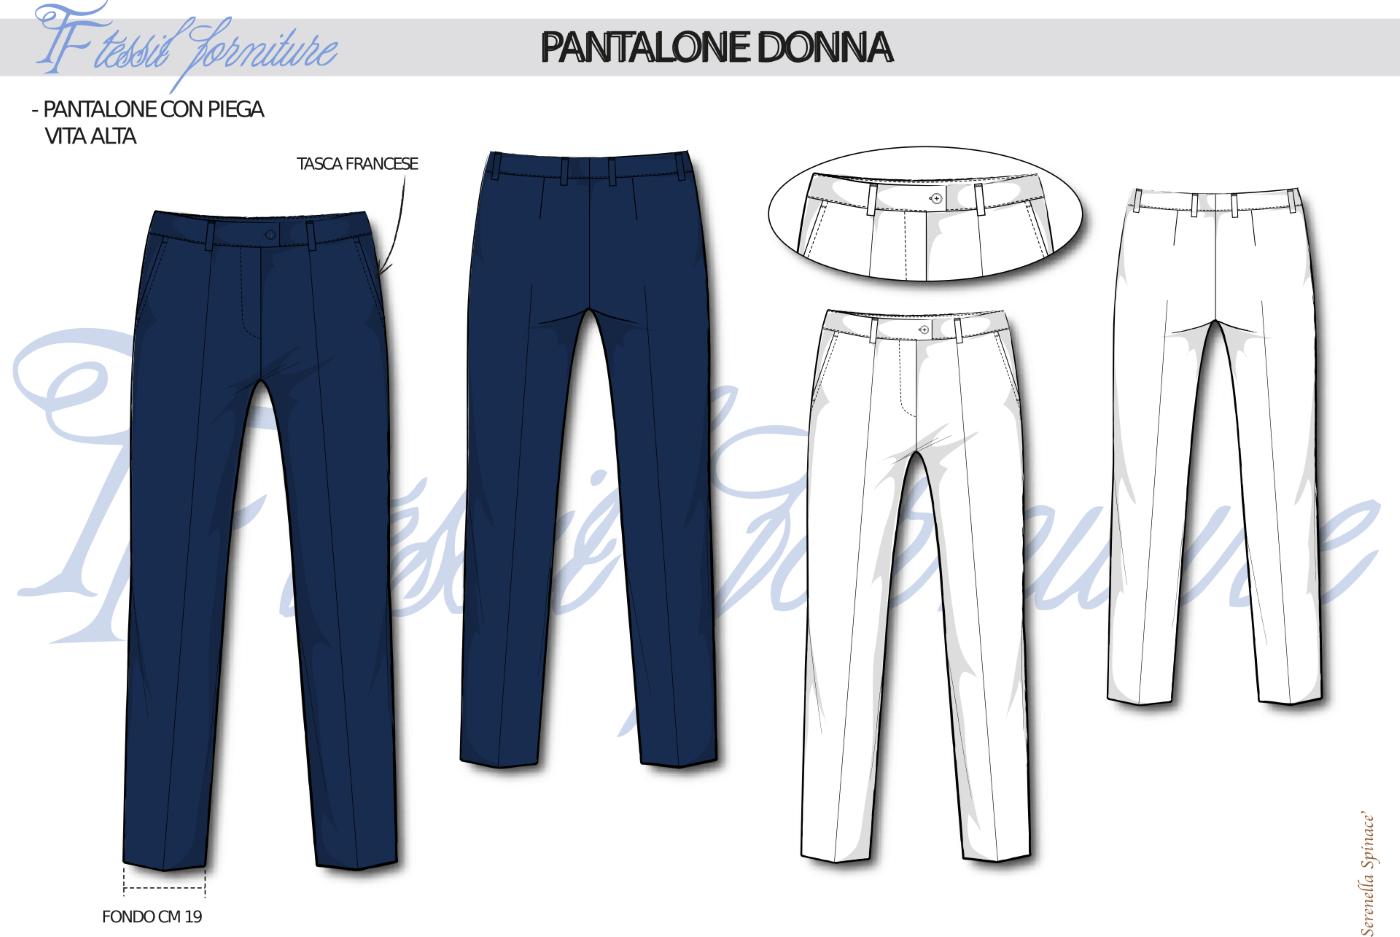 Bozzetto pantalone donna - Tessil Forniture